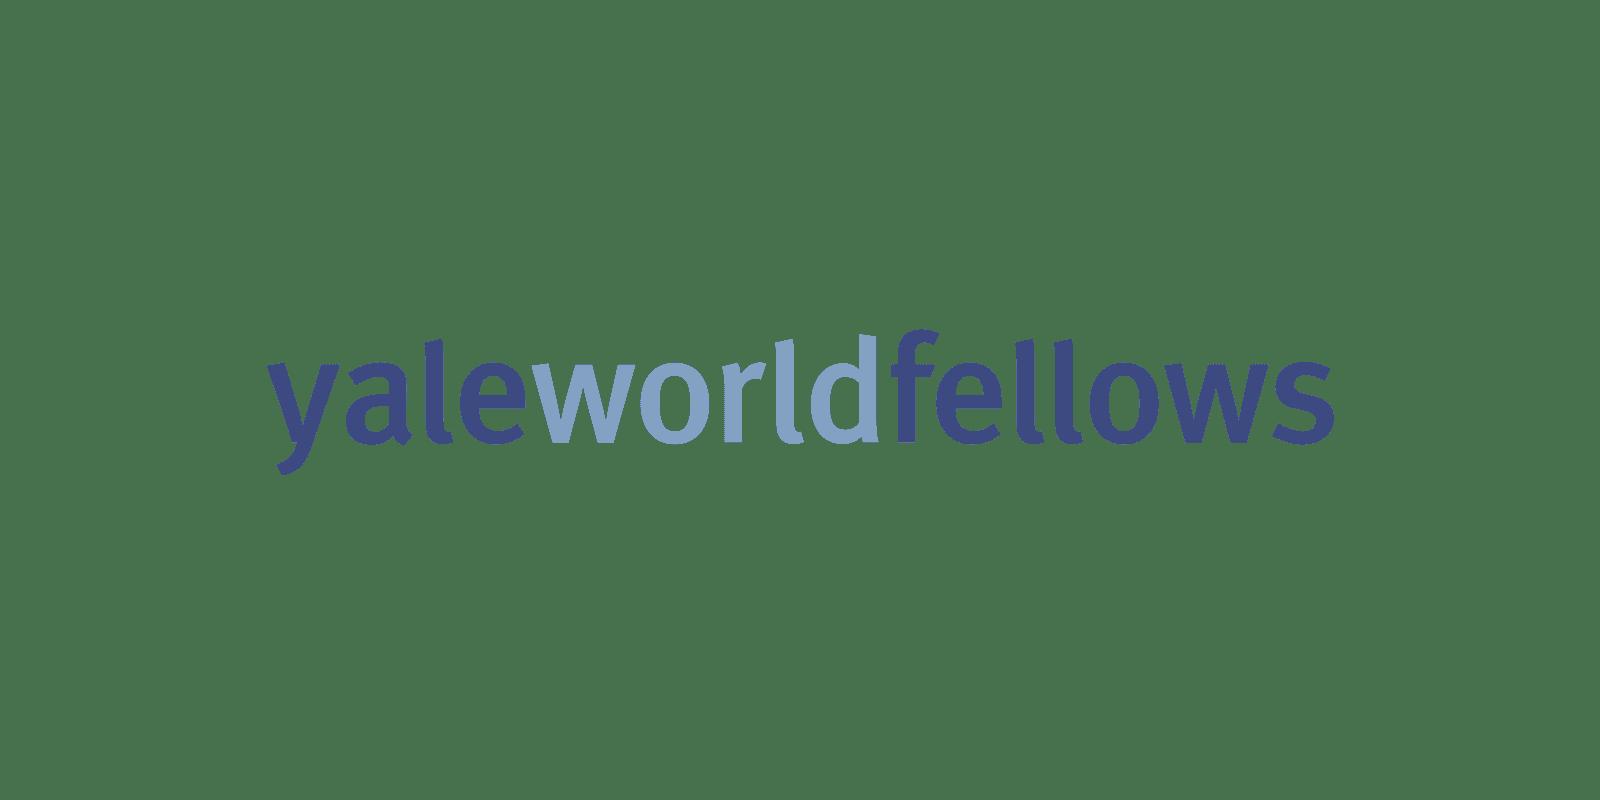 2016 Yale World Fellows Program for Mid-Career Emerging